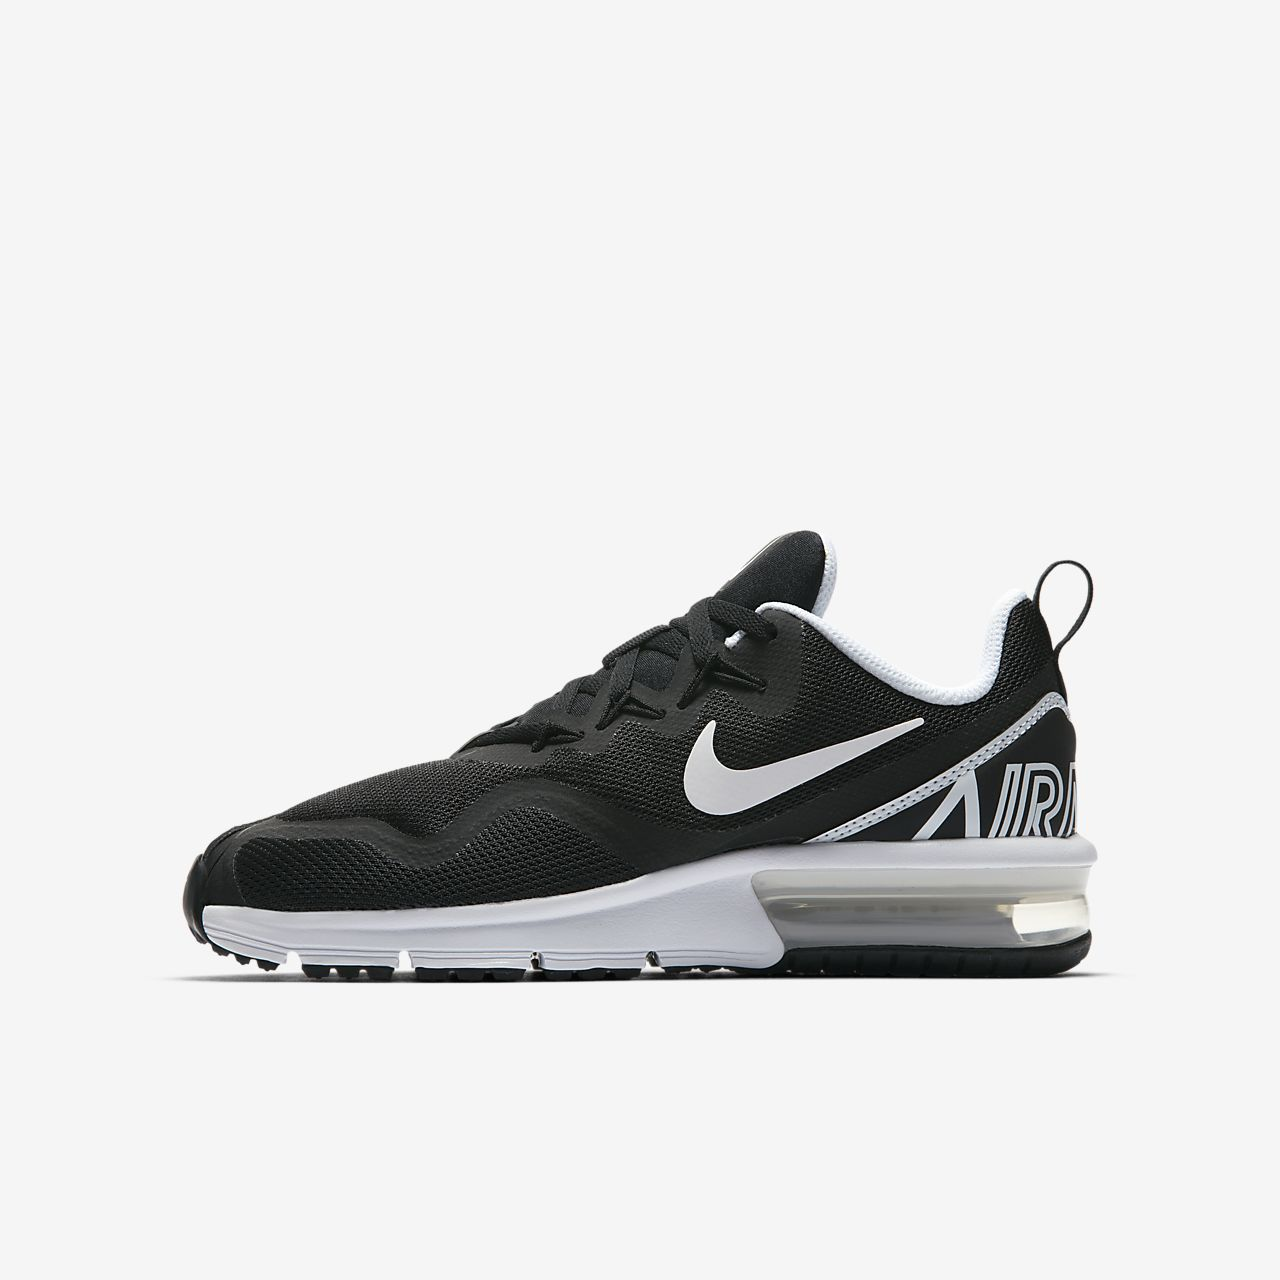 Nike Air Max Fury Laufschuh für ältere Kinder